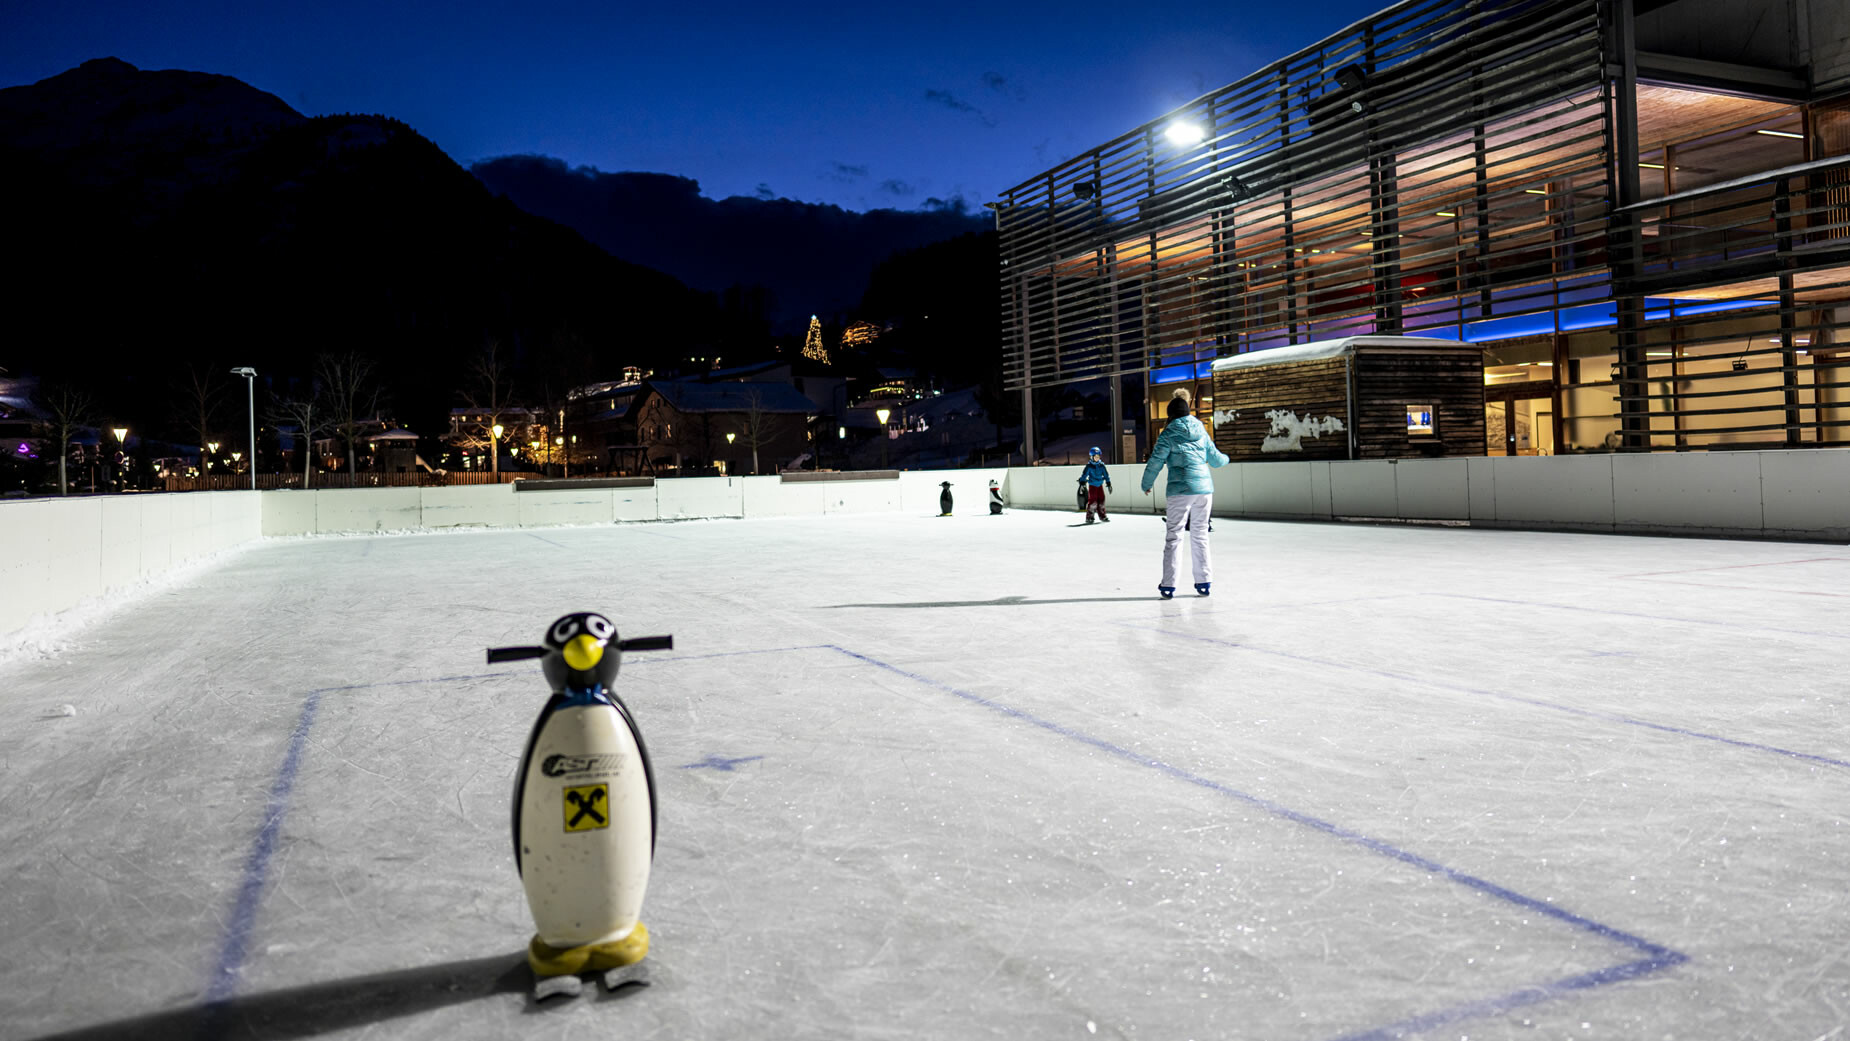 Eislaufen beim Arlberg WellCom in St. Anton am Arlberg